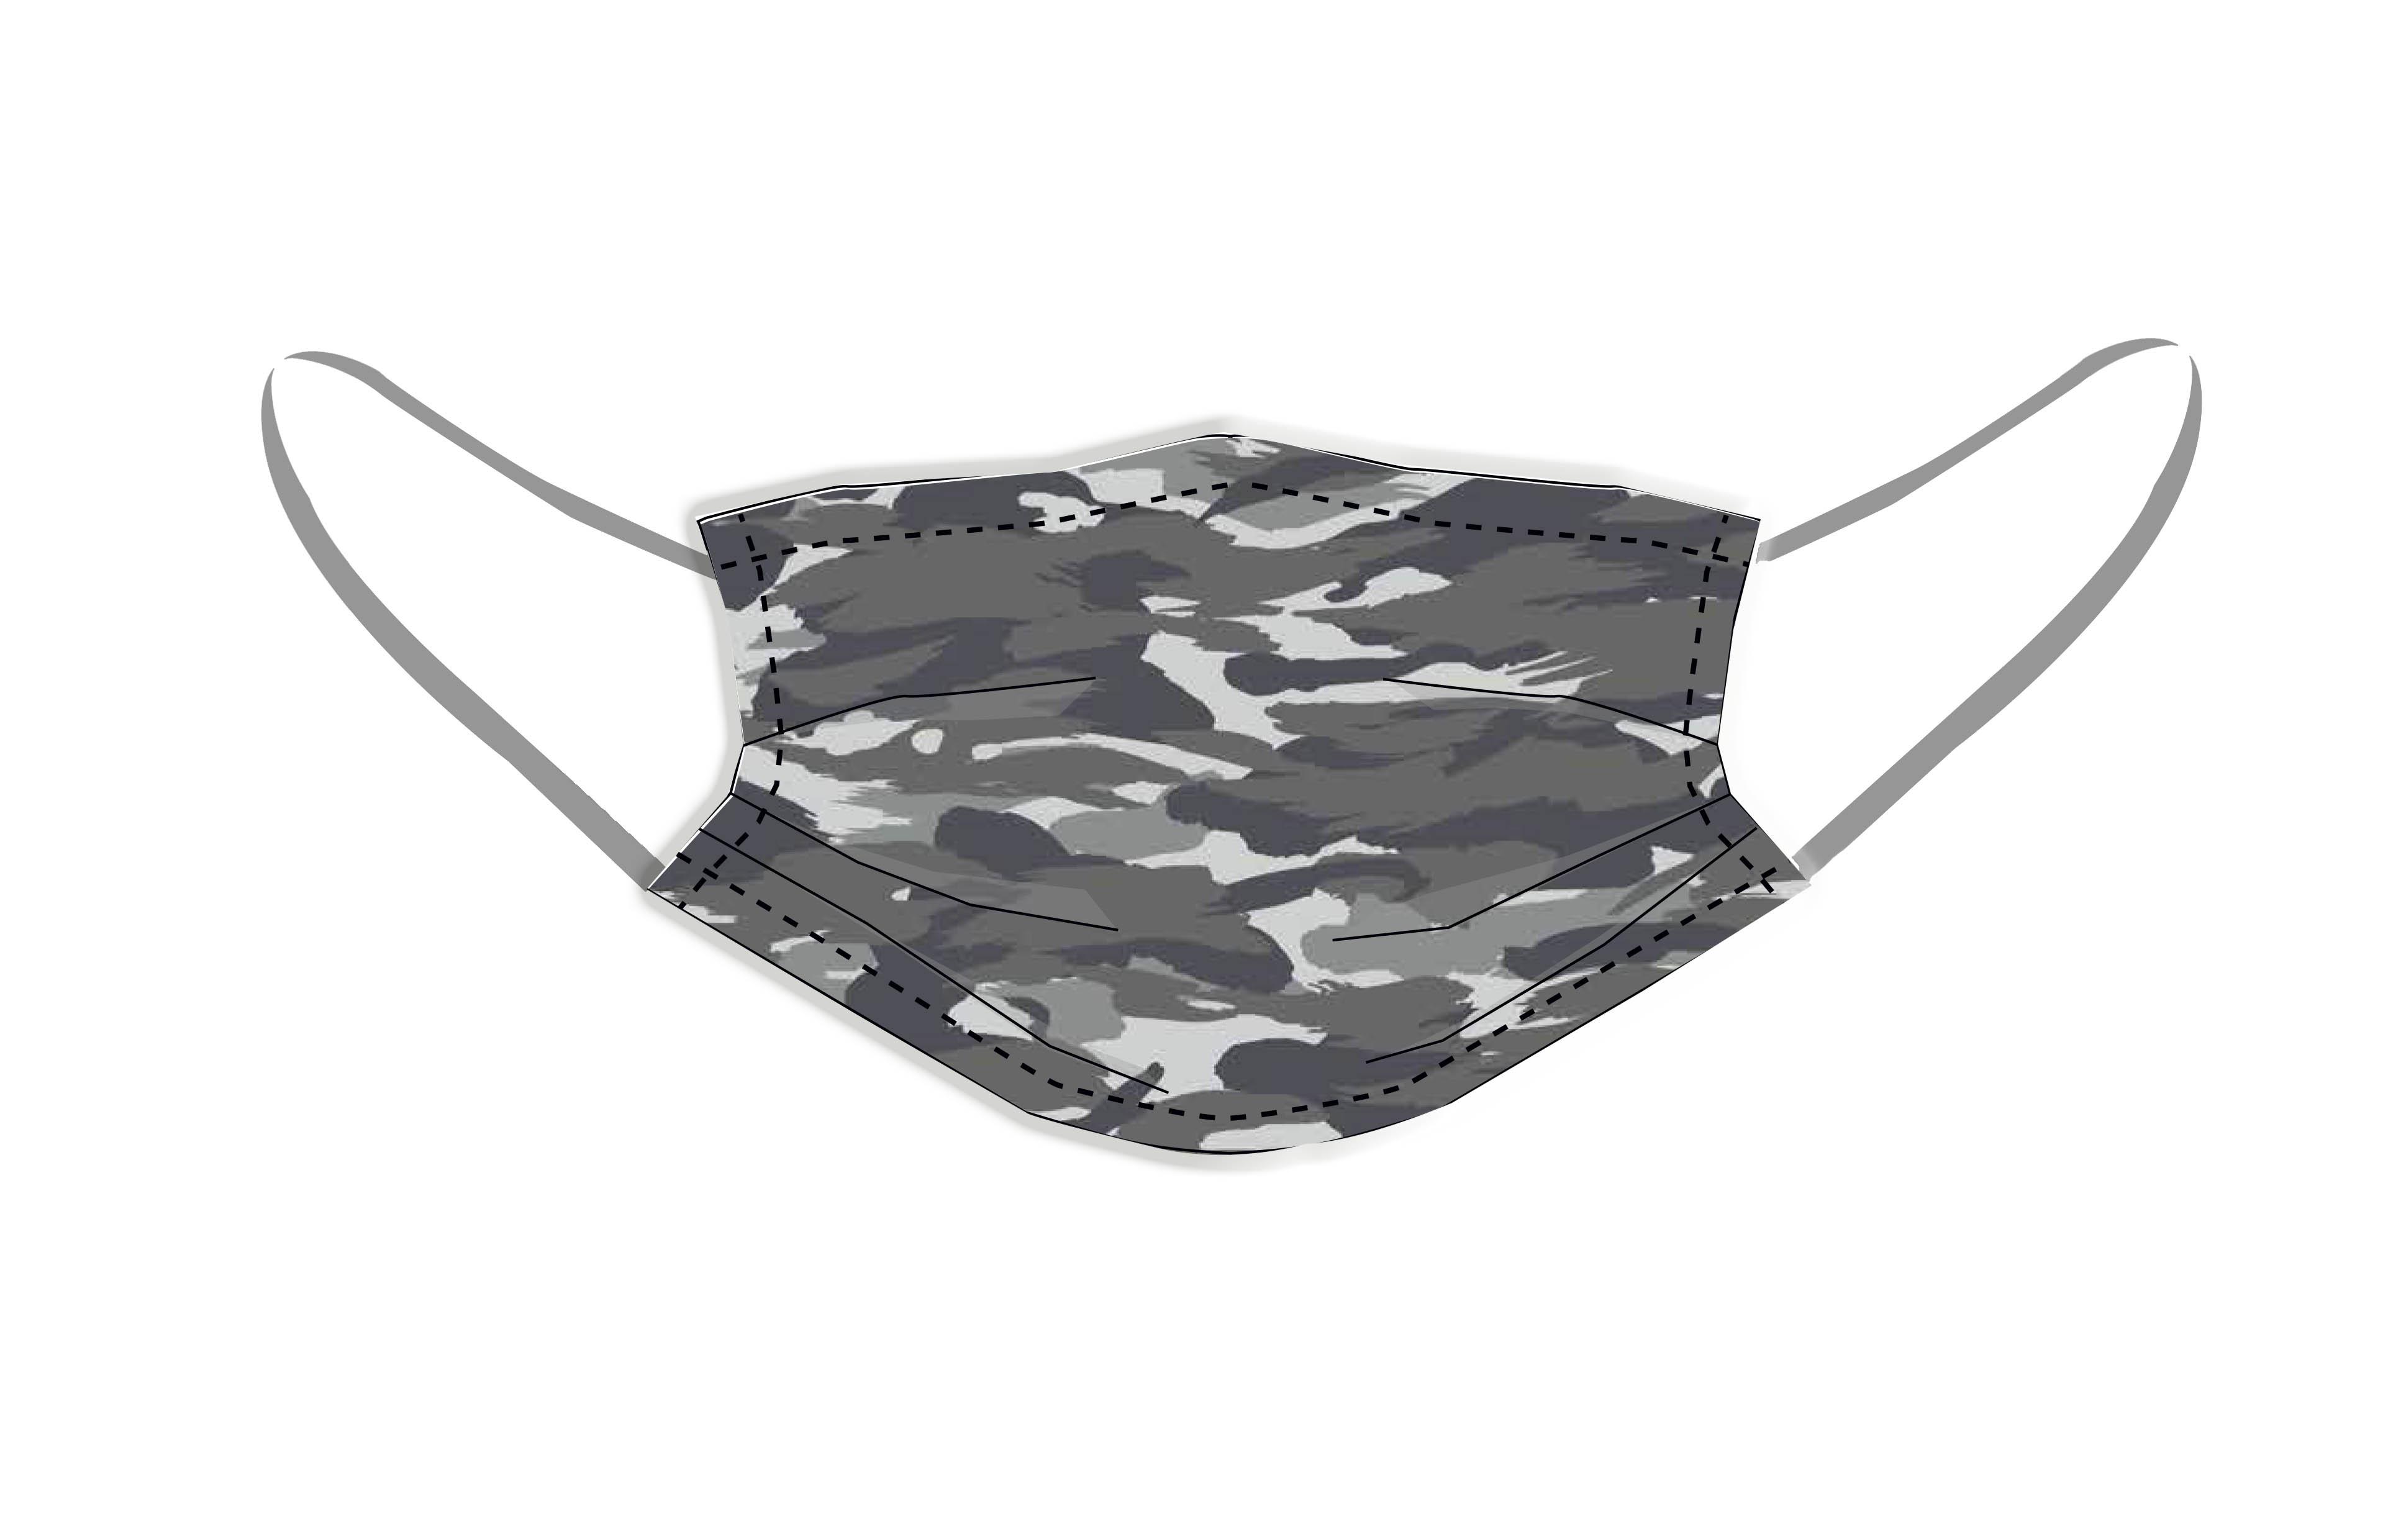 Mascarillas reutilizables higiénicas camuflaje Grey